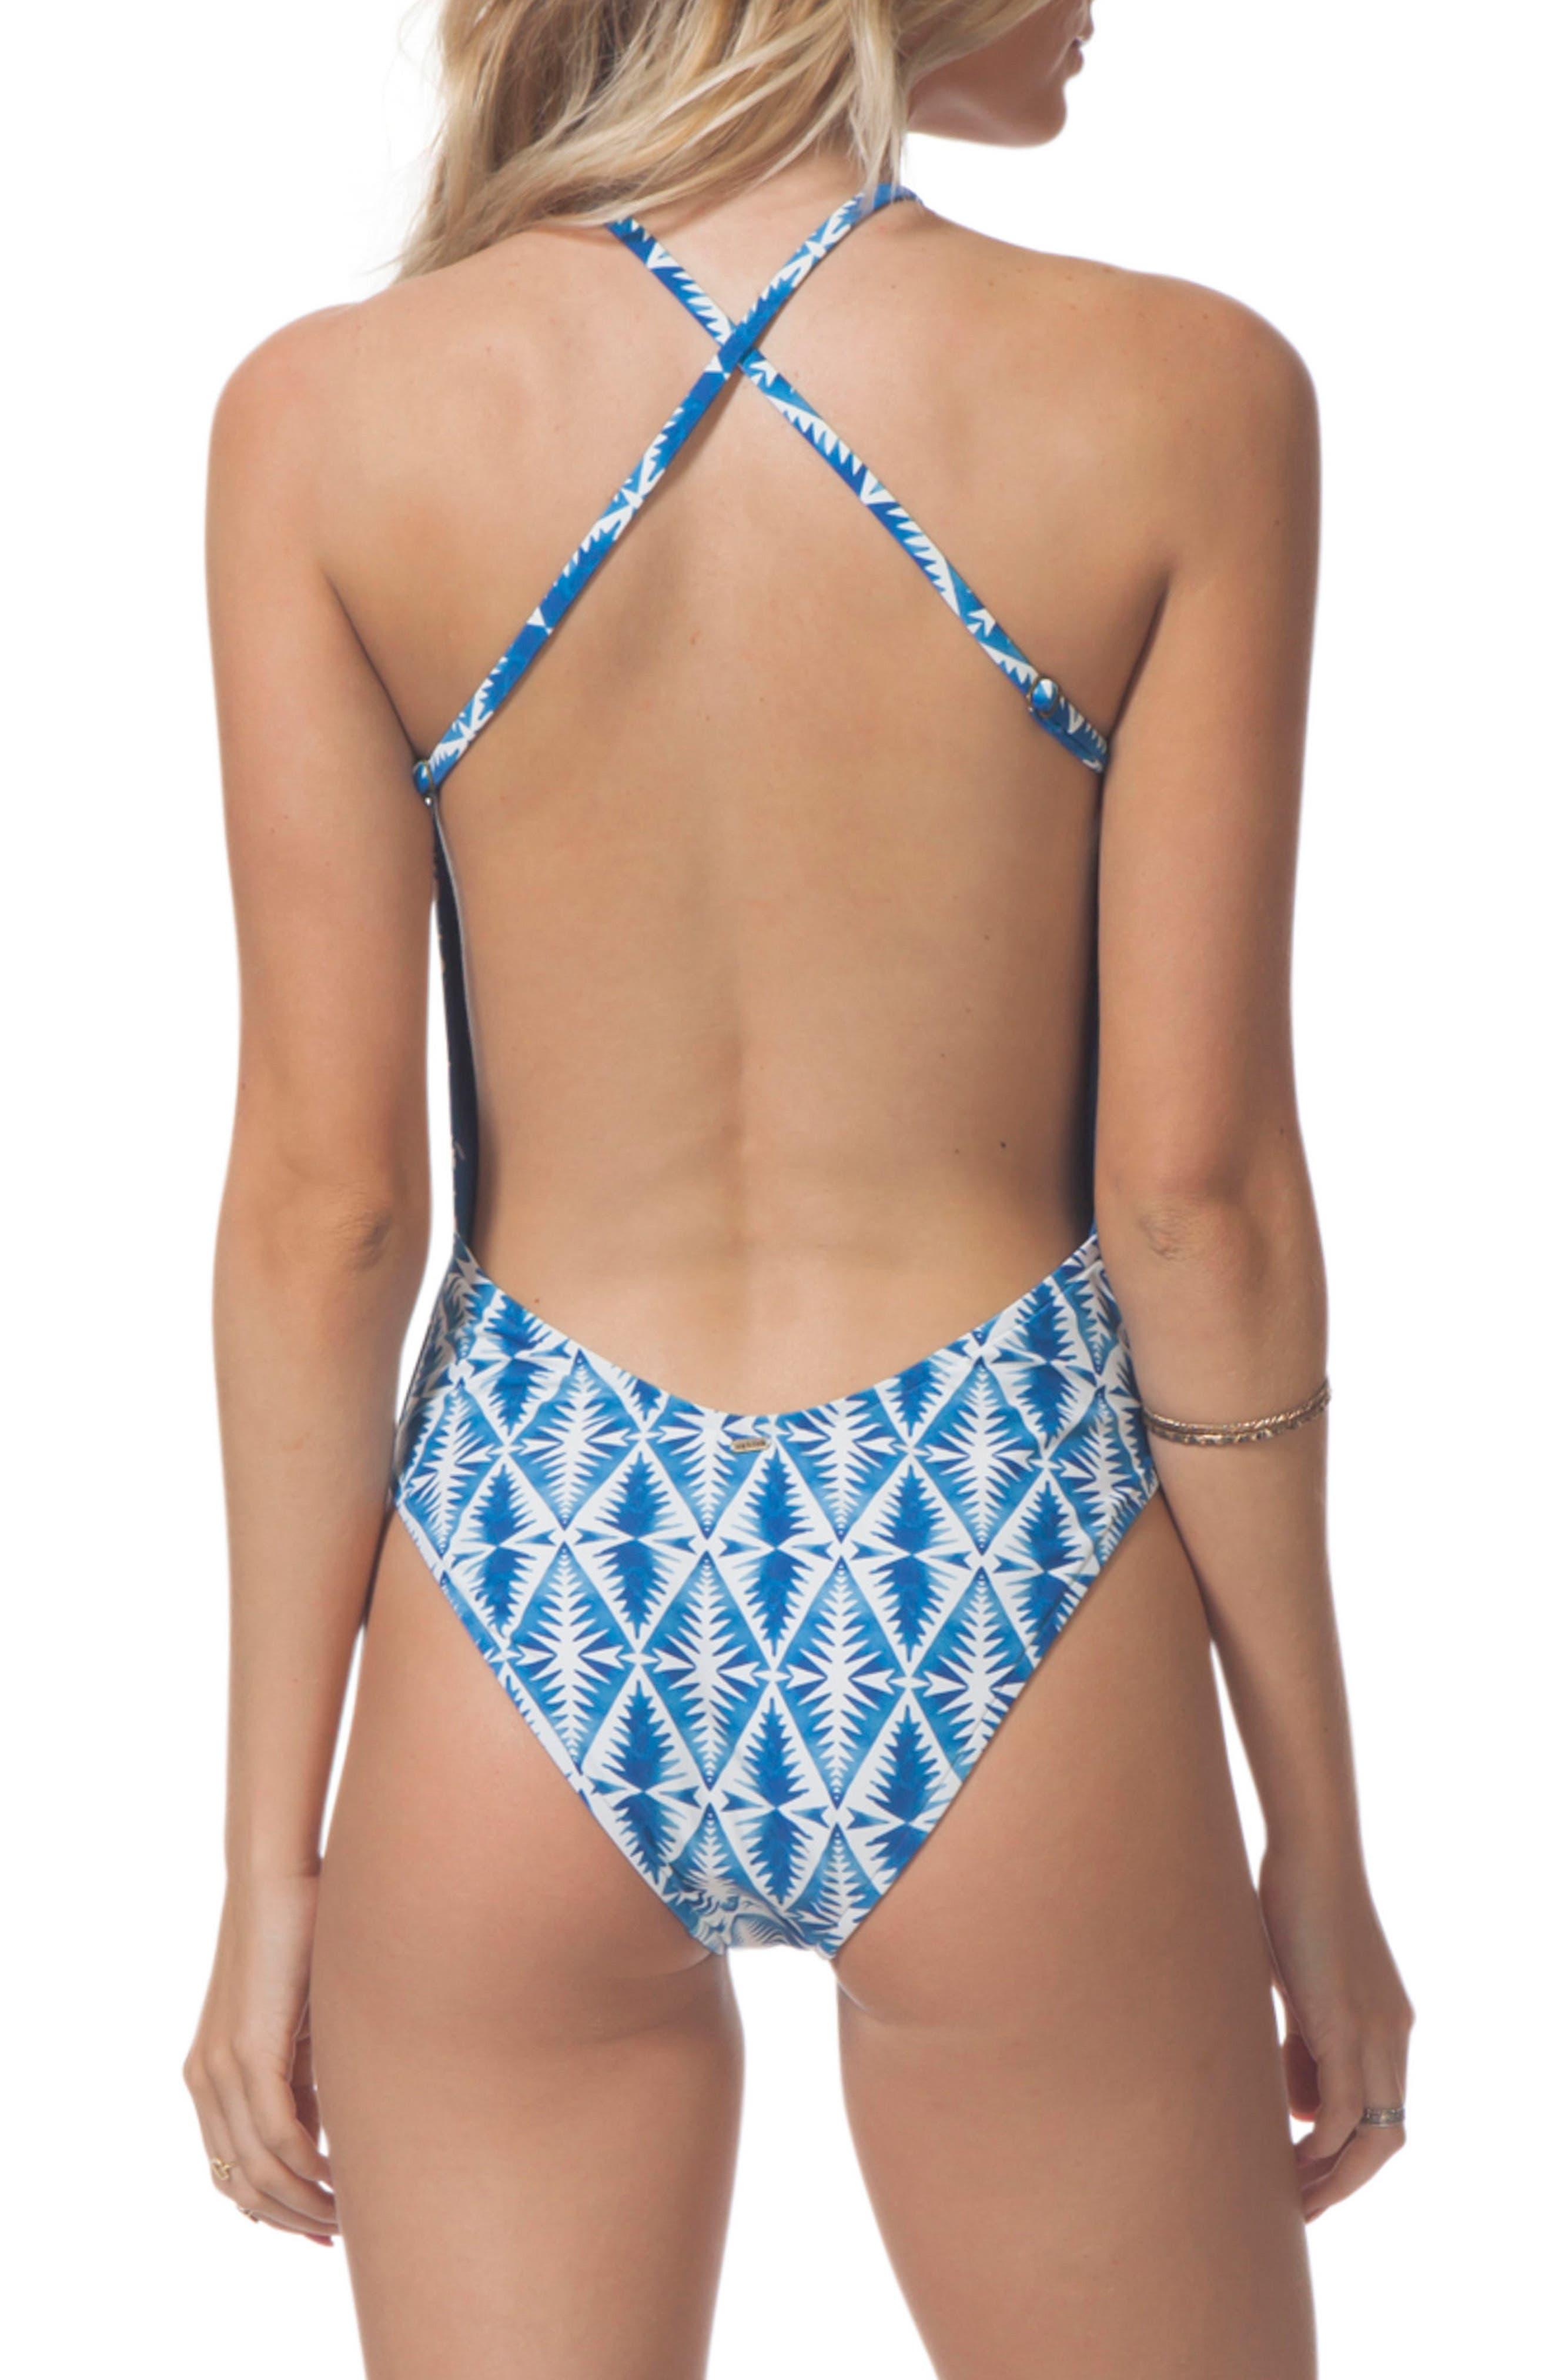 Beach Bazaar One-Piece Swimsuit,                             Alternate thumbnail 2, color,                             400